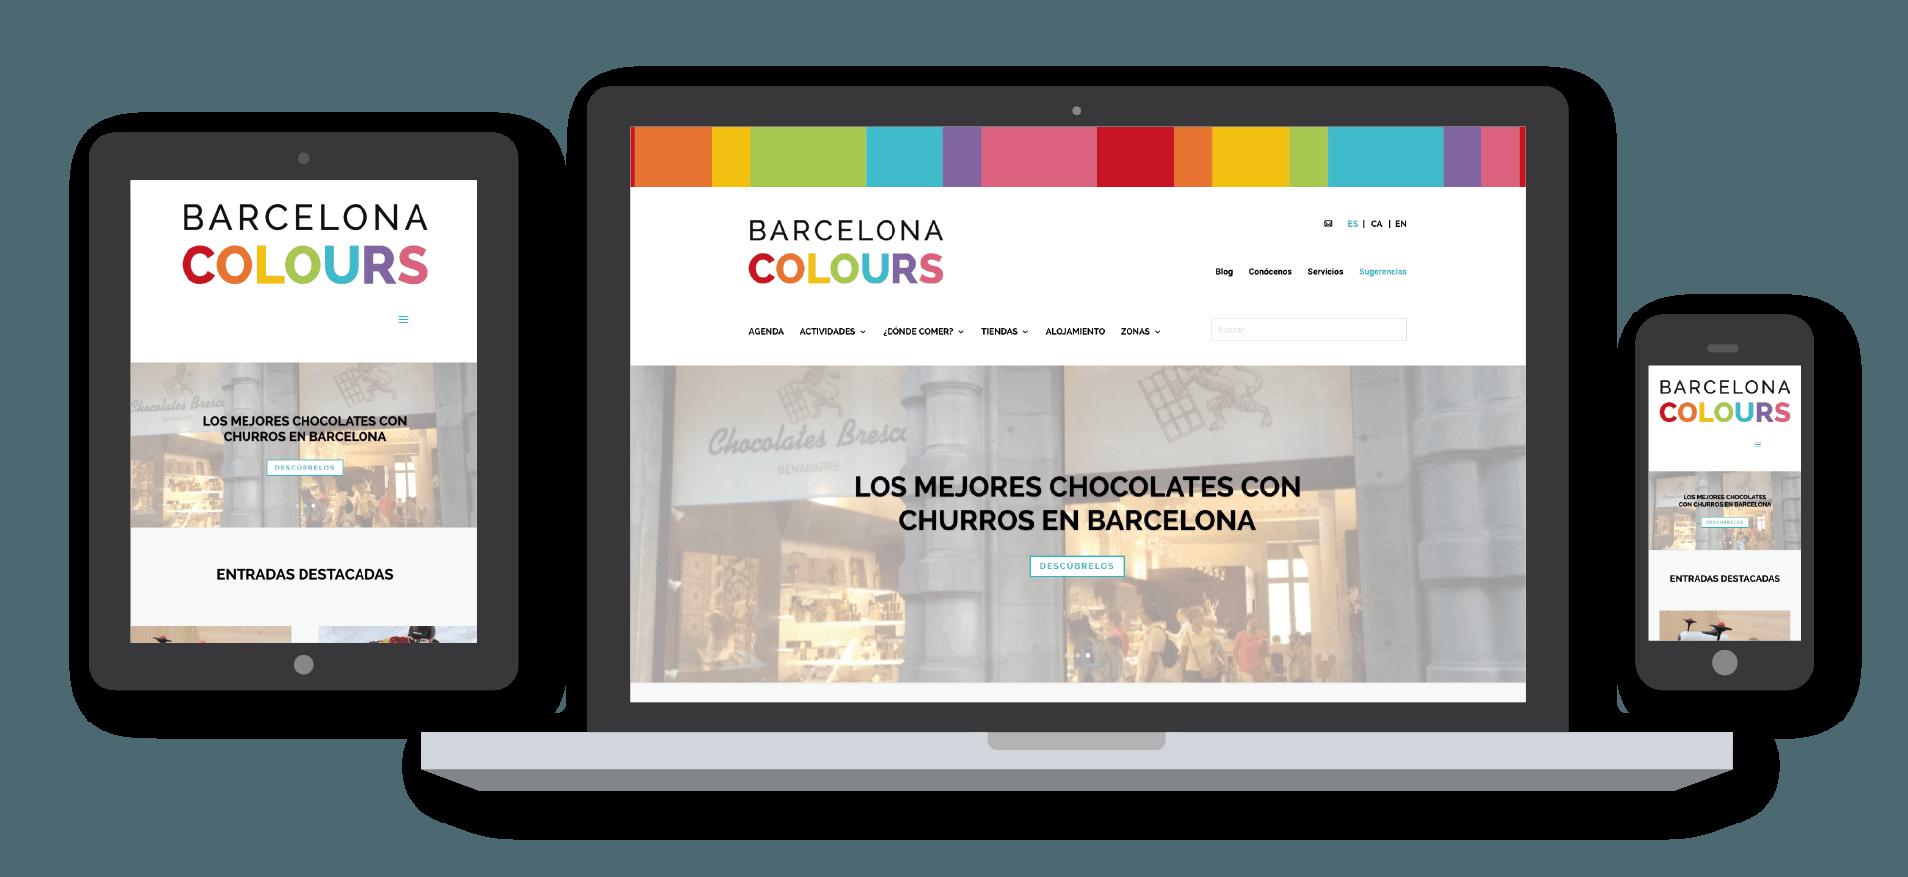 Barcelona Colours | Actividades en Barcelona con niños de 0 a 14 años